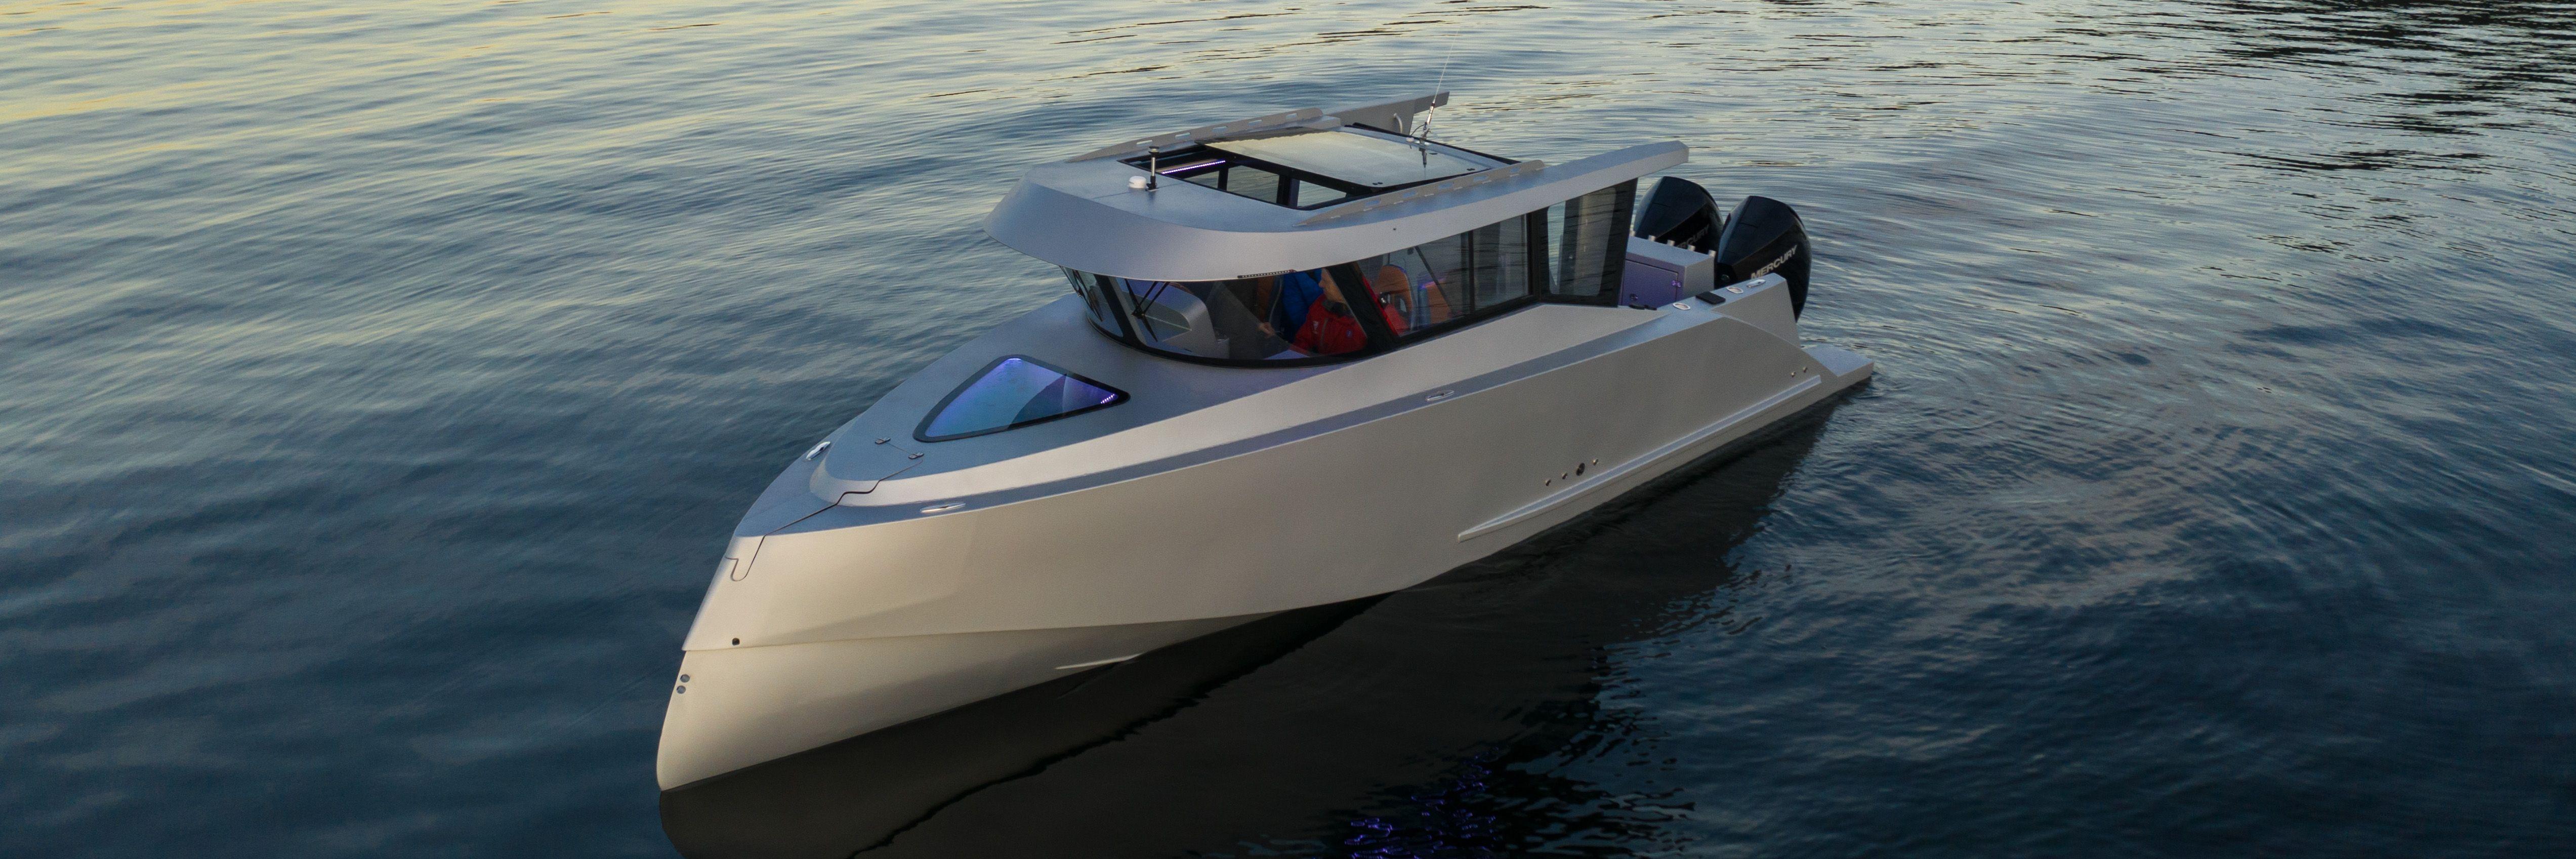 Freedom 28 Jasper Marine In 2021 Boat Design Yacht Design Power Boats